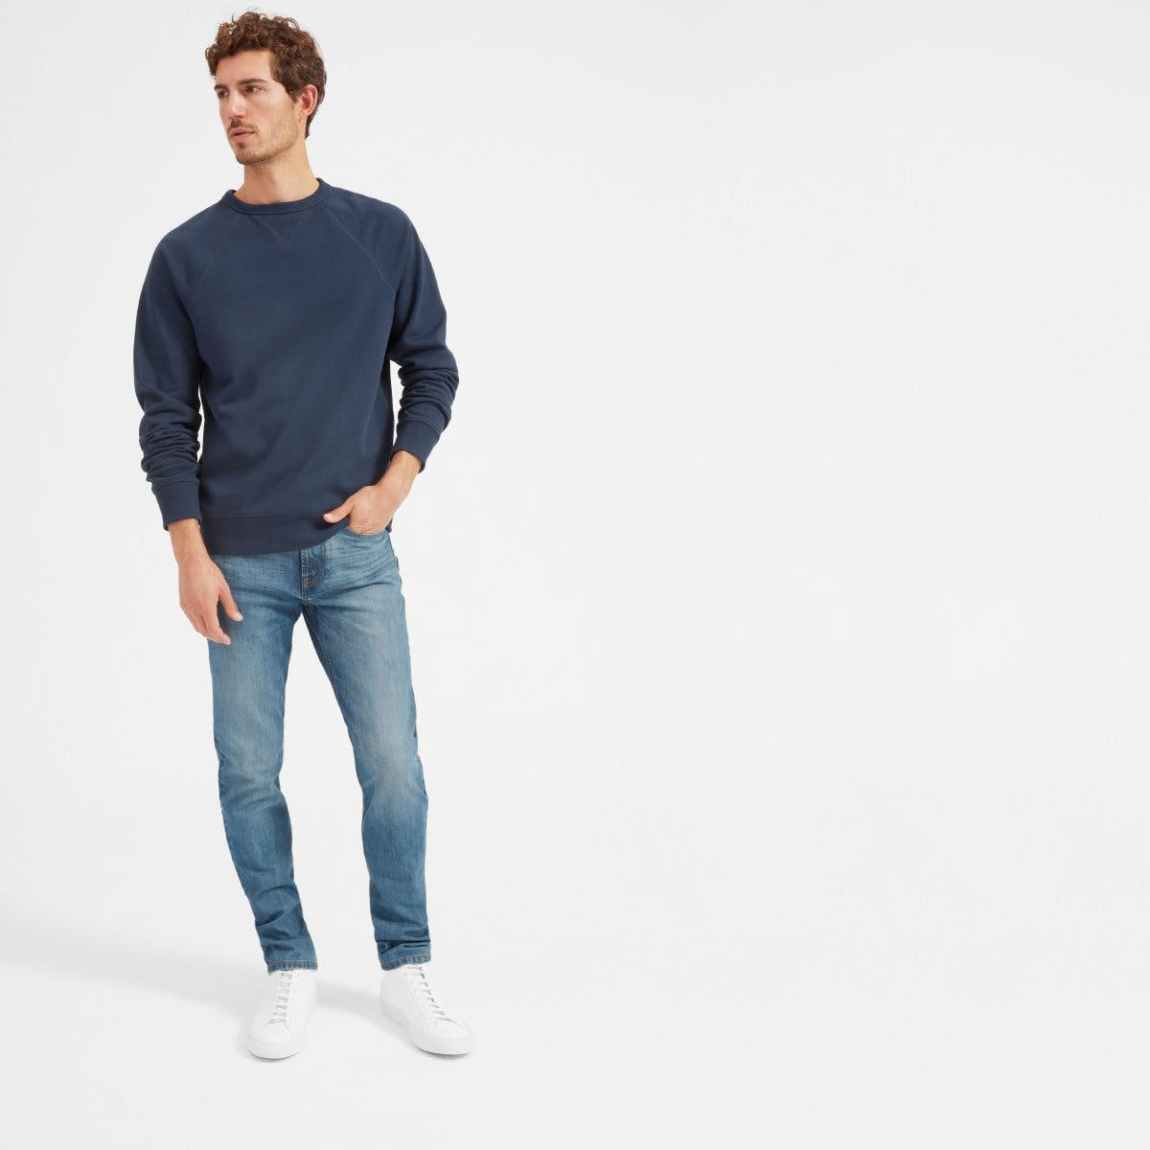 everlane, everlane jeans, everlane denim, japanese denim, slim fit jeans, straight jeans, denimblog, denim blog